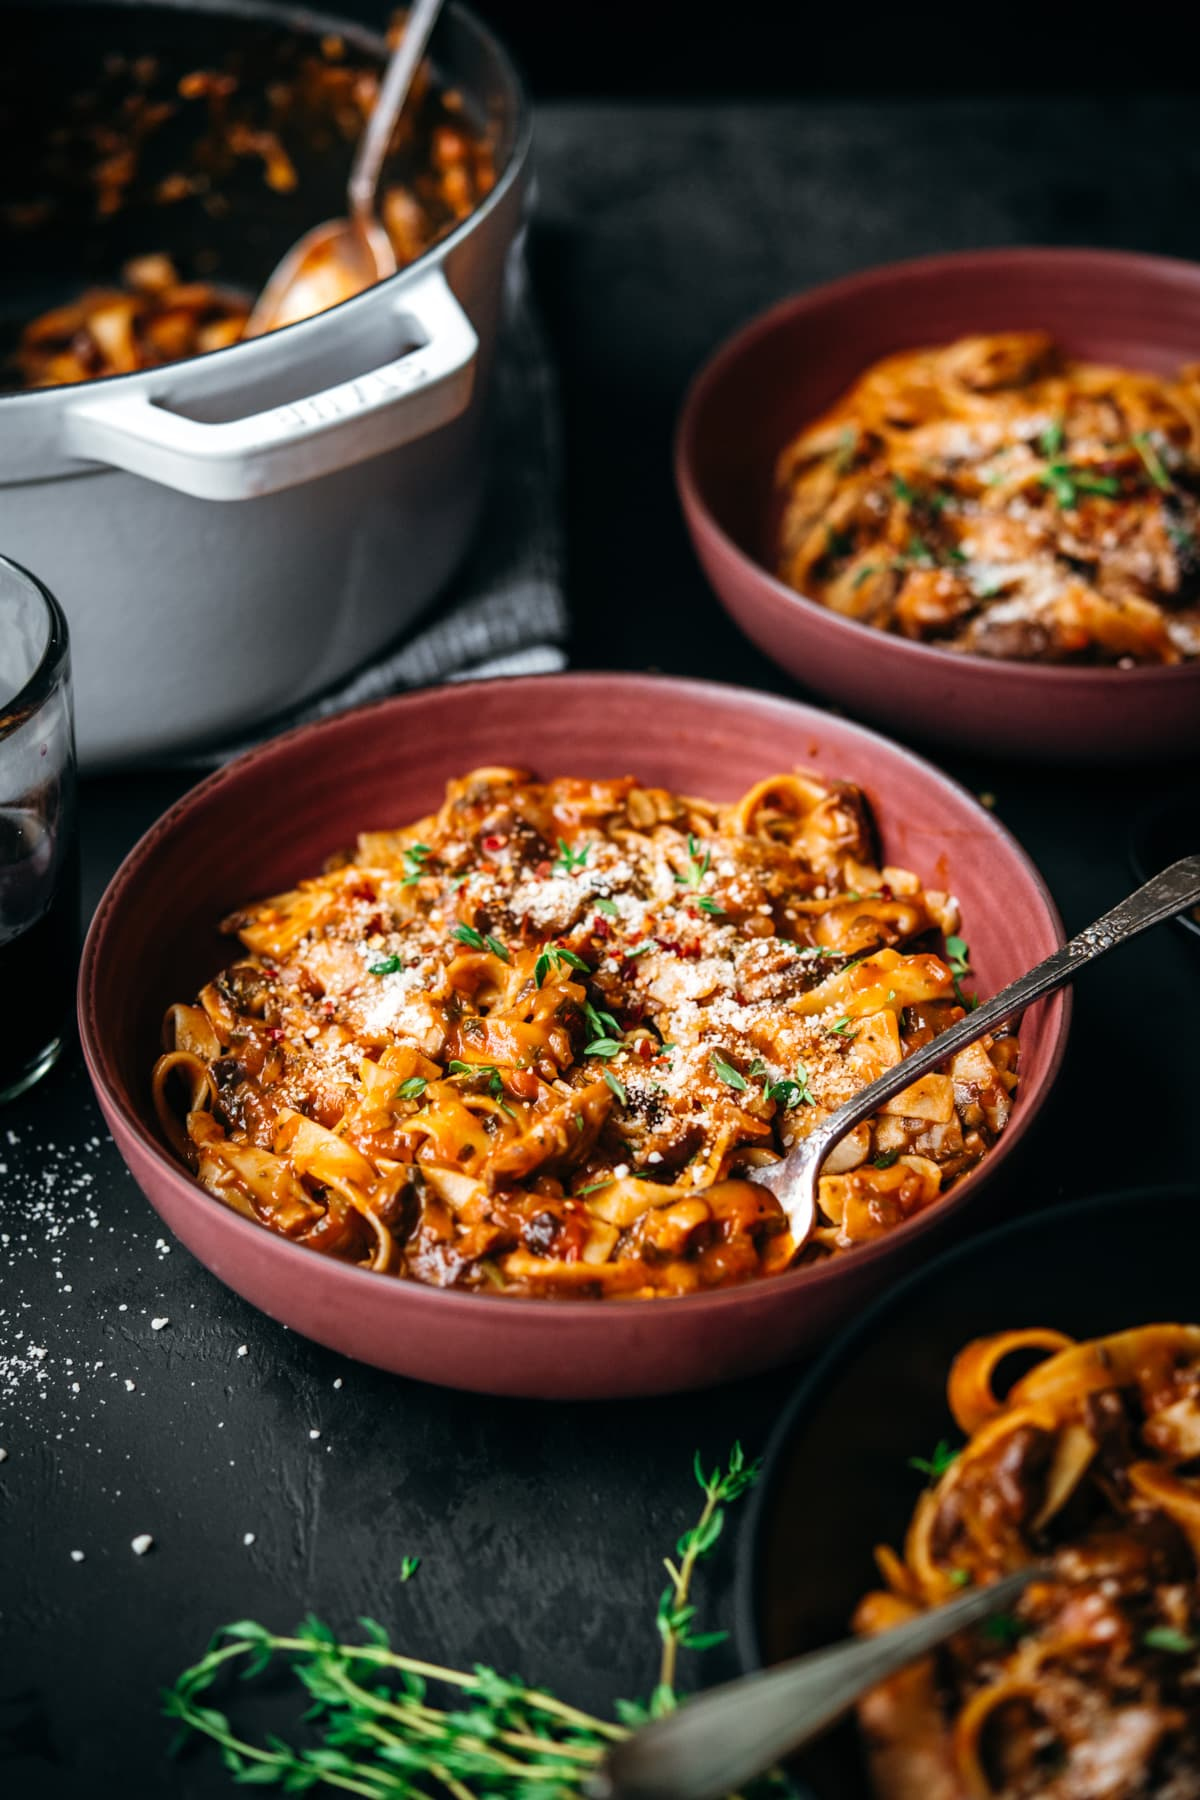 side view of vegan mushroom ragu over pasta in a red bowl.